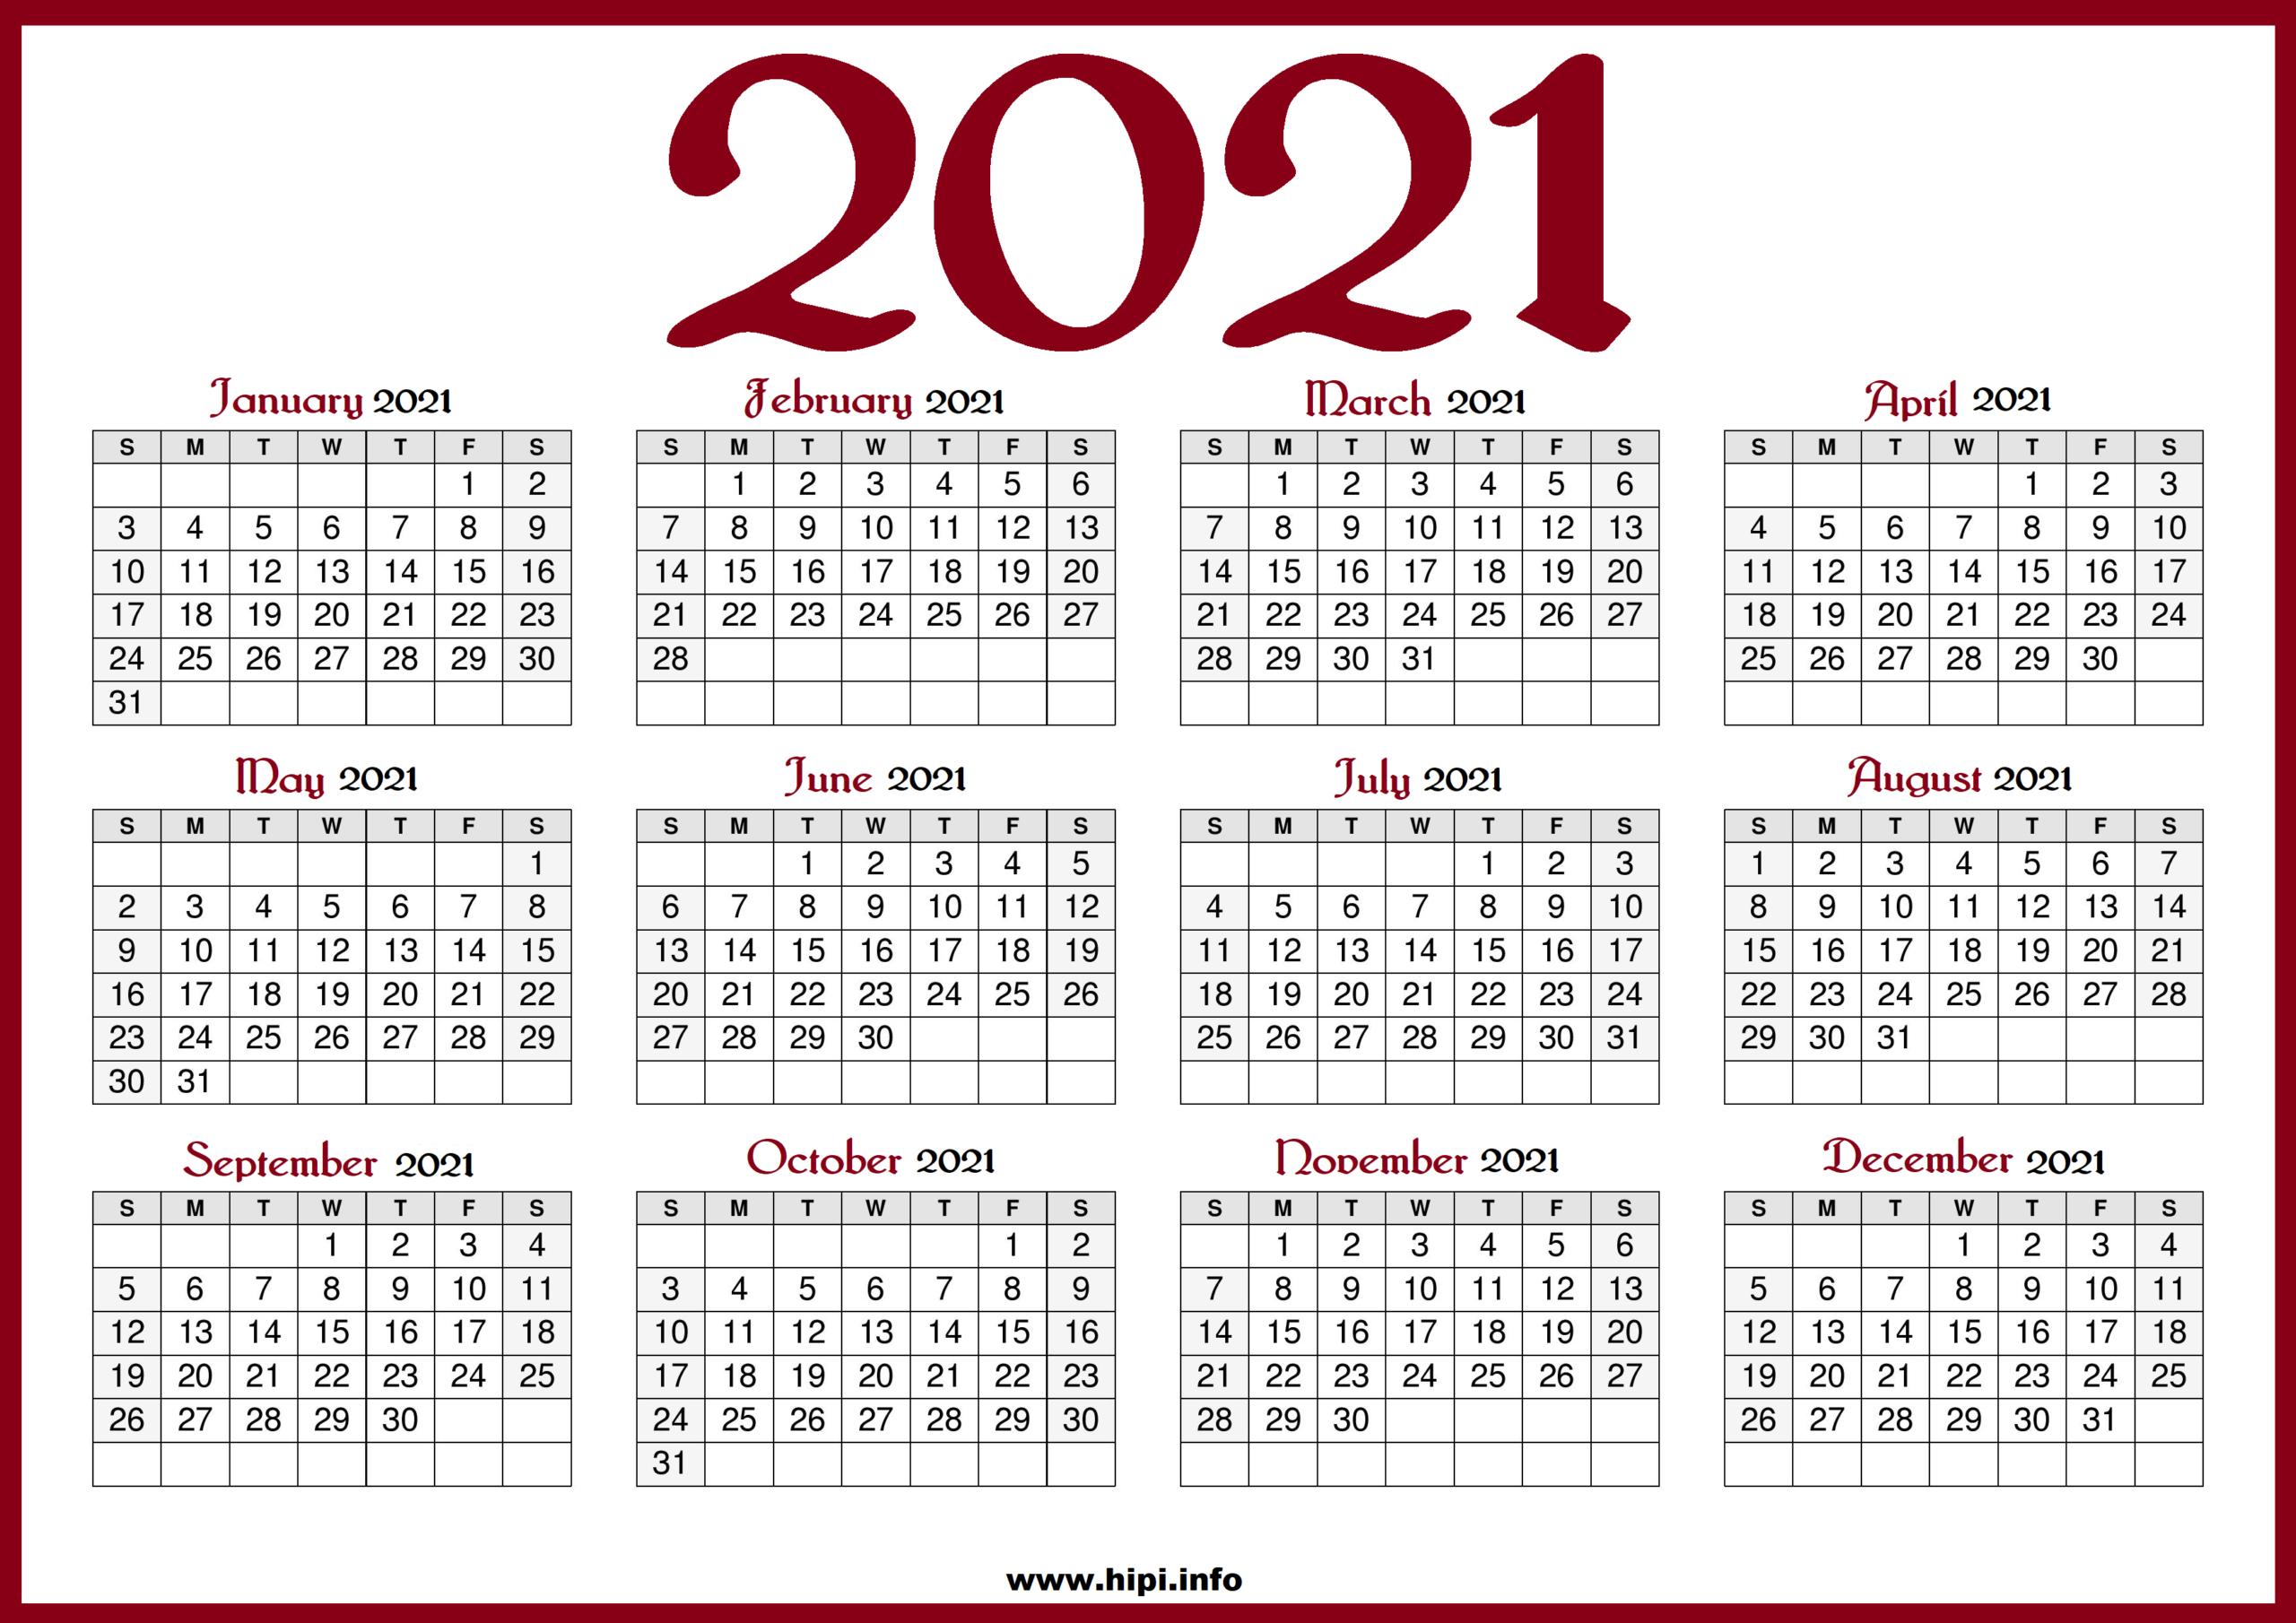 Printable 2021 Calendar With Us Holidays - Red Color - Hipi